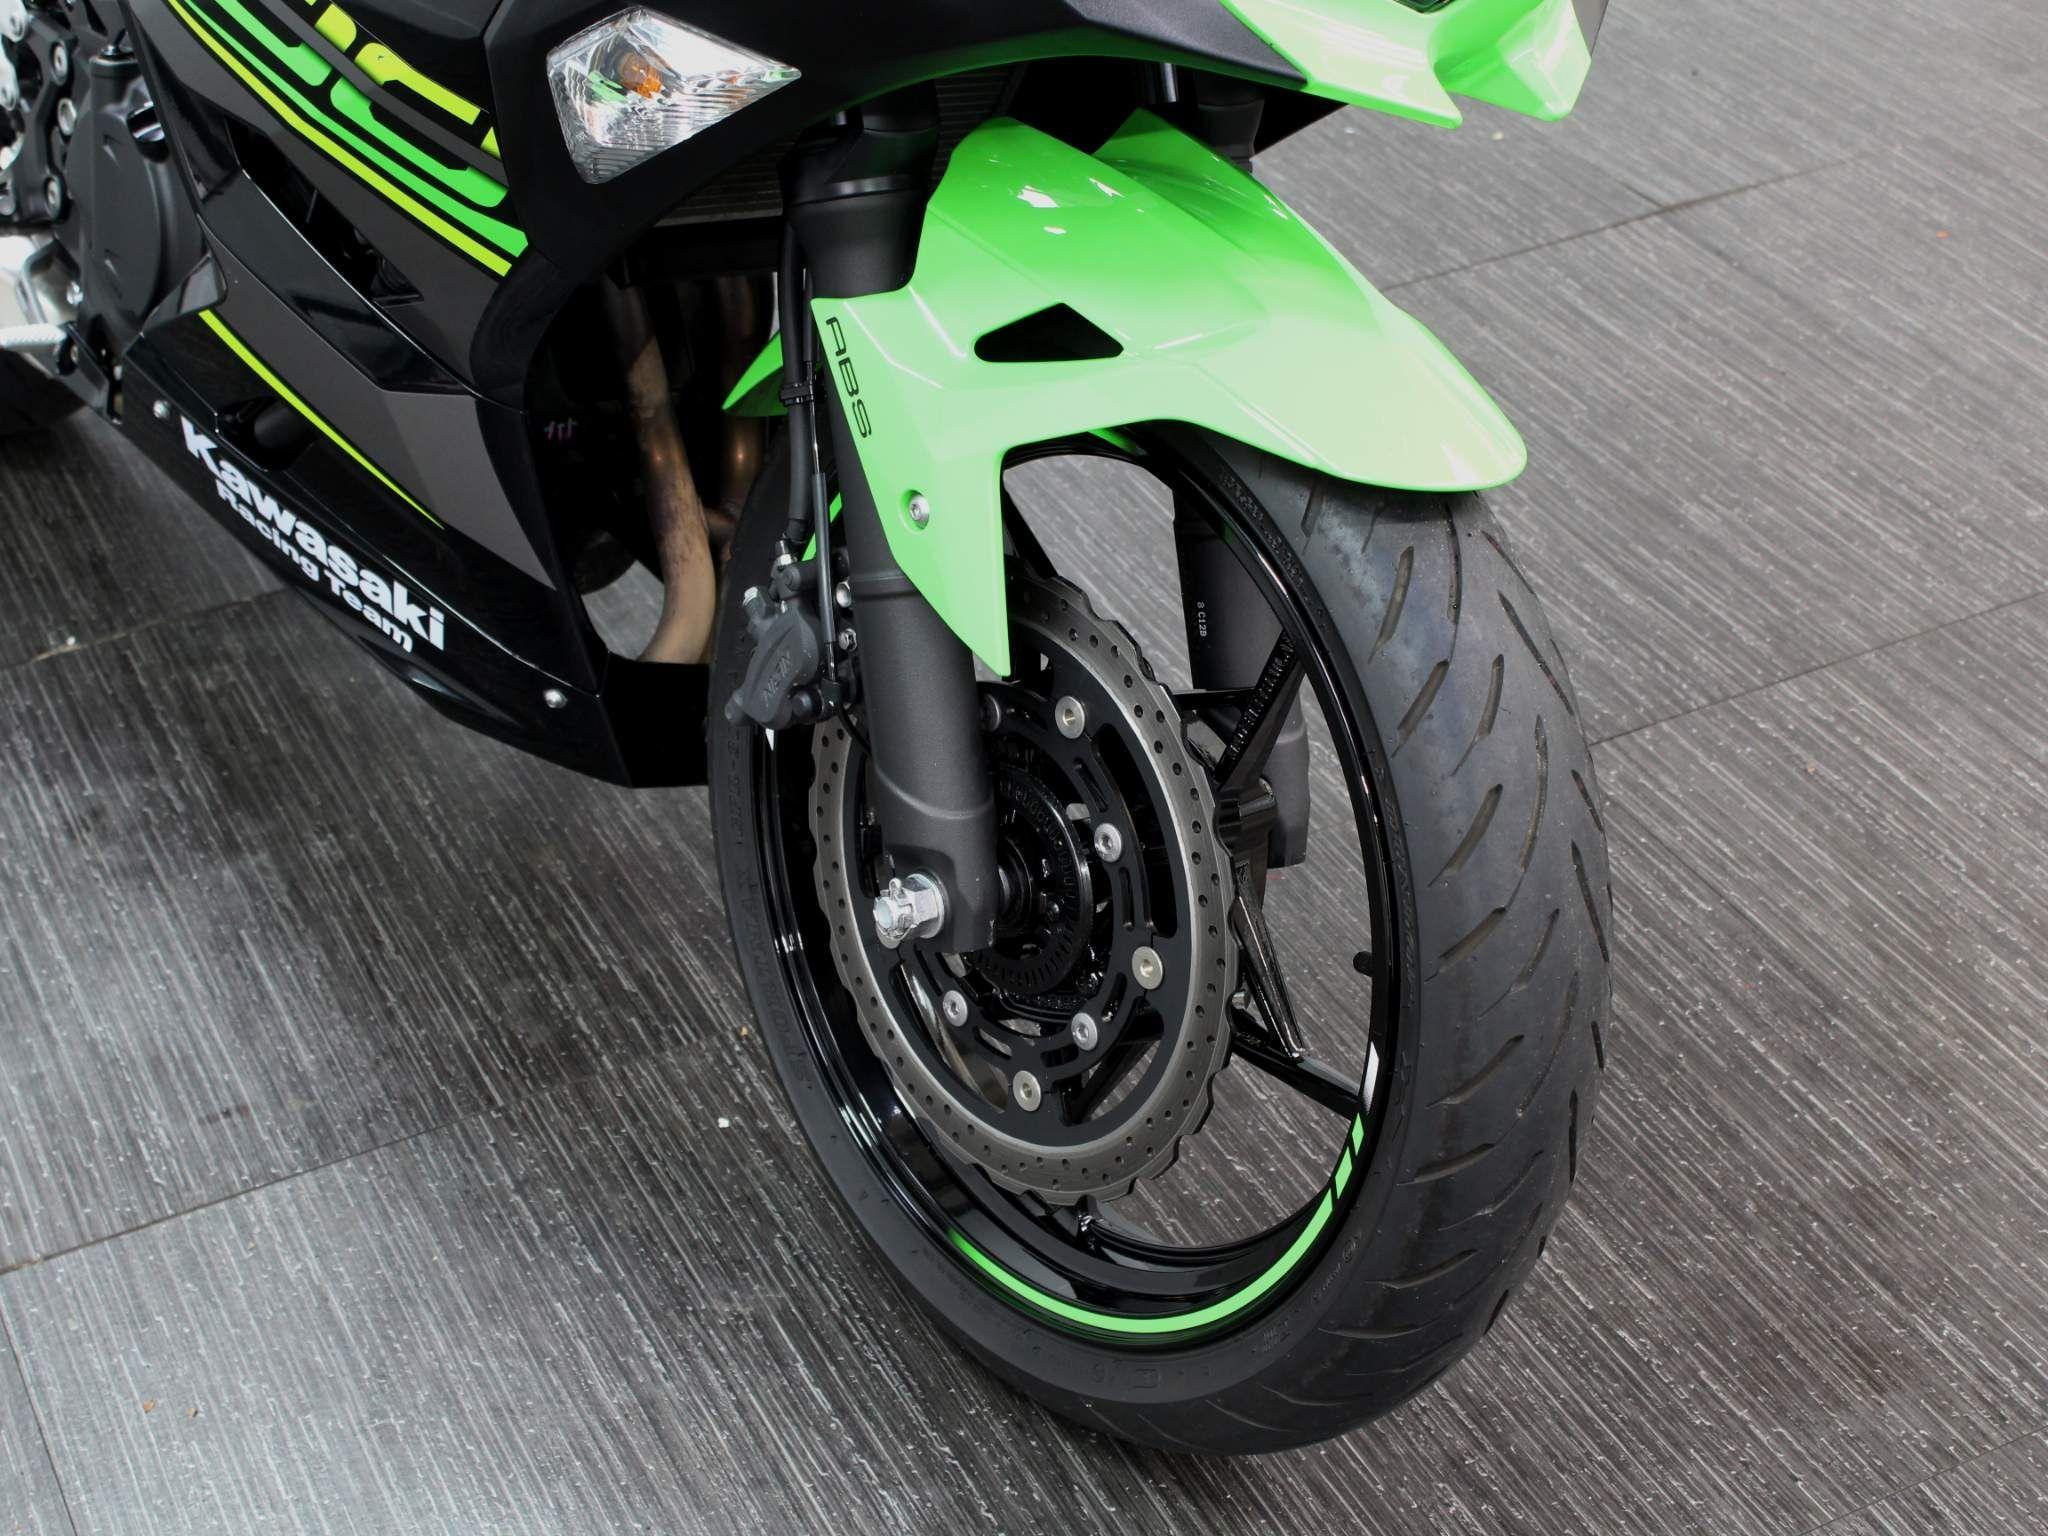 Kawasaki Ninja 400 Images